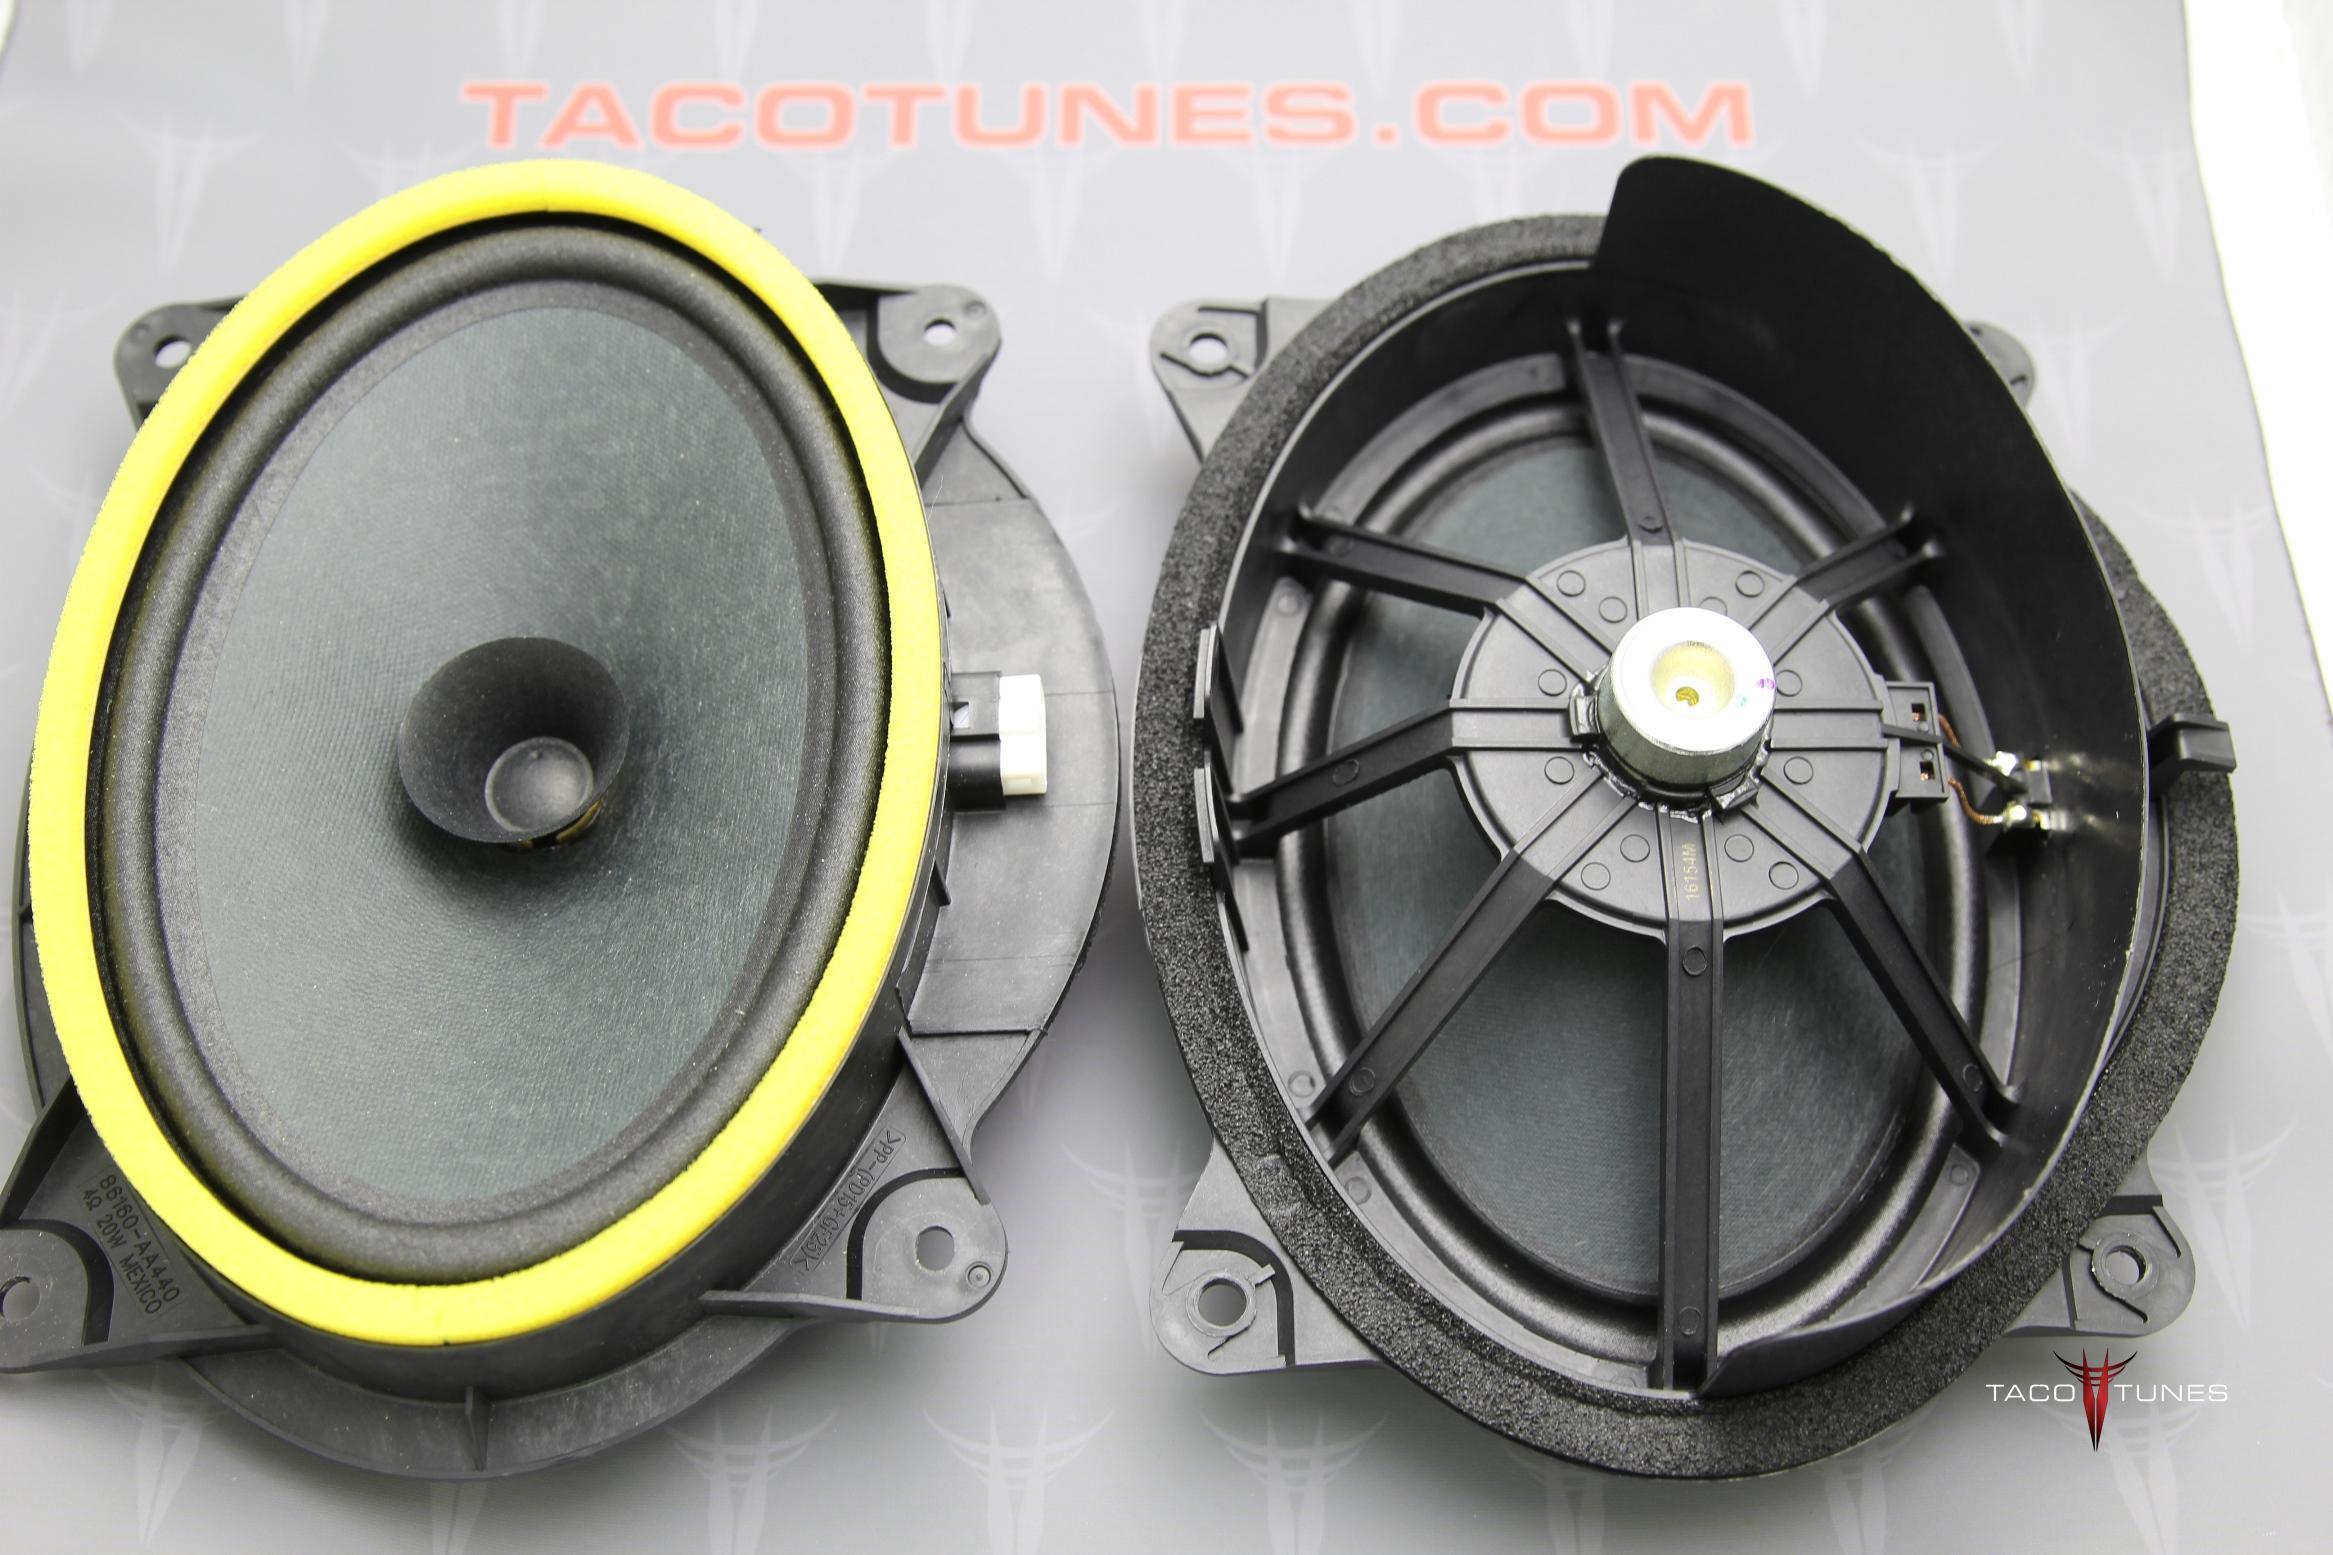 Toyota 4Runner Stock Front Door Speakers & How to install component speakers 2010+ Toyota 4Runner pezcame.com